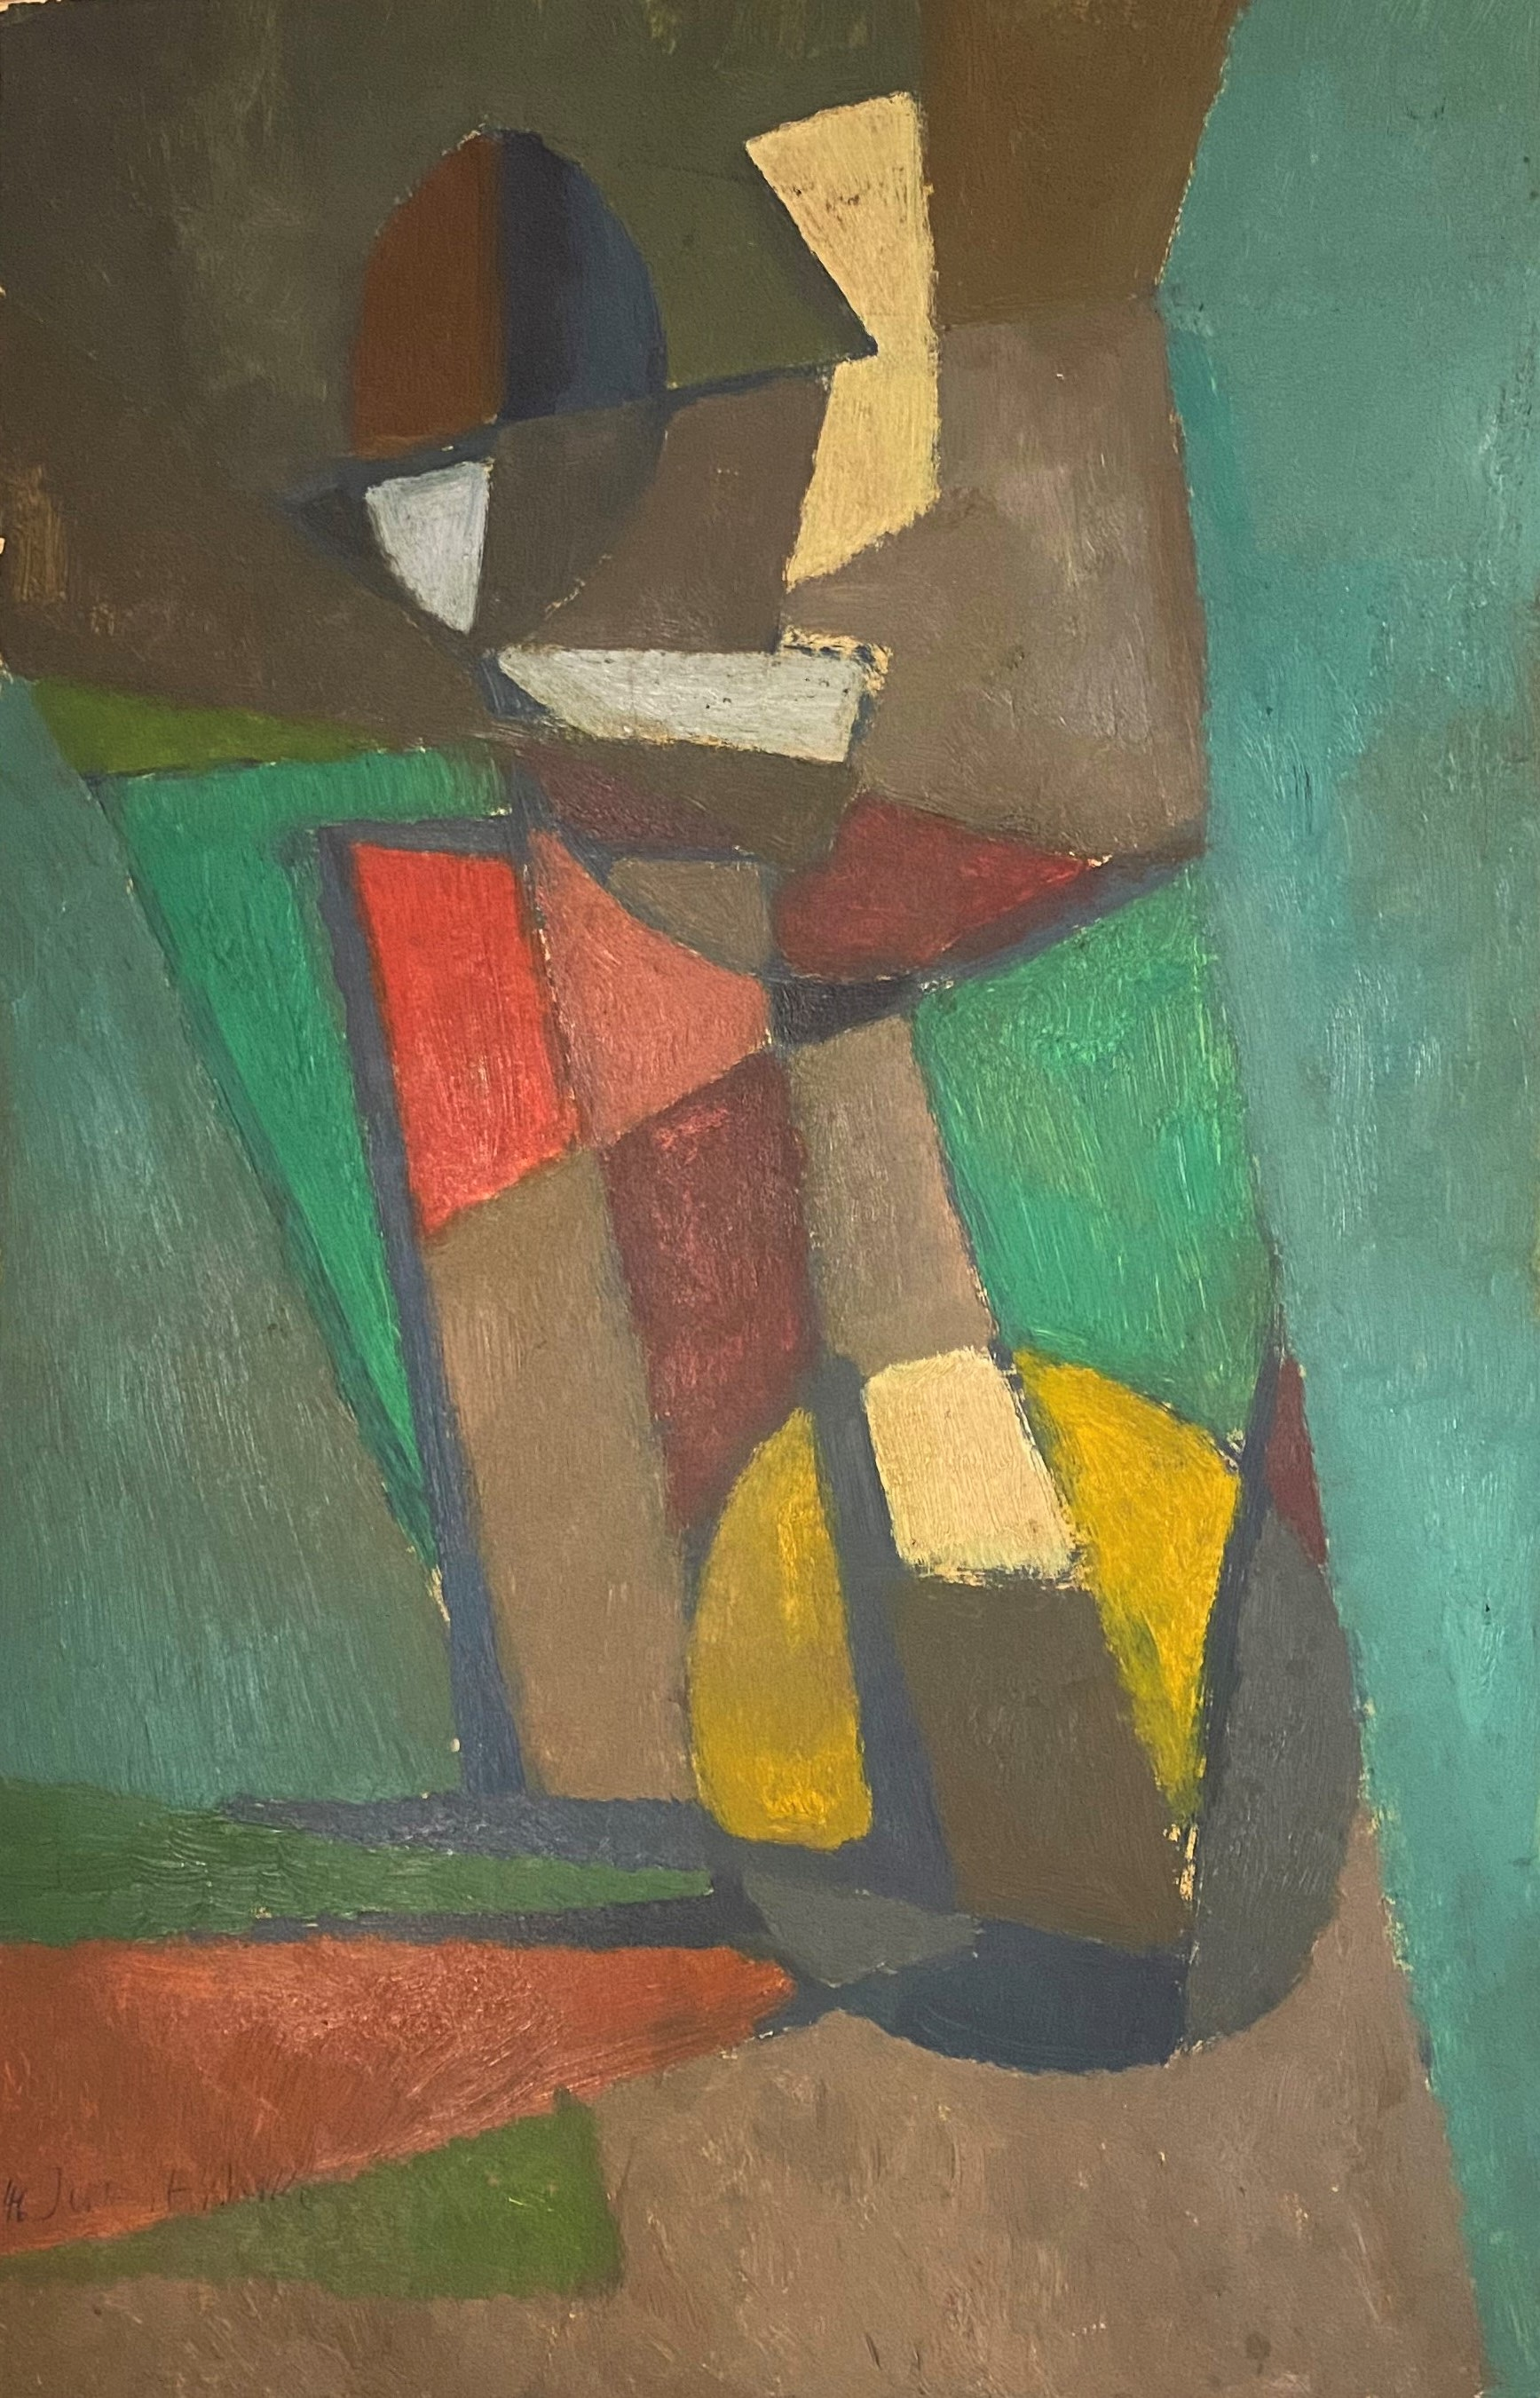 Hubert Berke (German, 1908–1979) (AR), untitled, 1946, oil on cardboard, 48 x 30 cm.